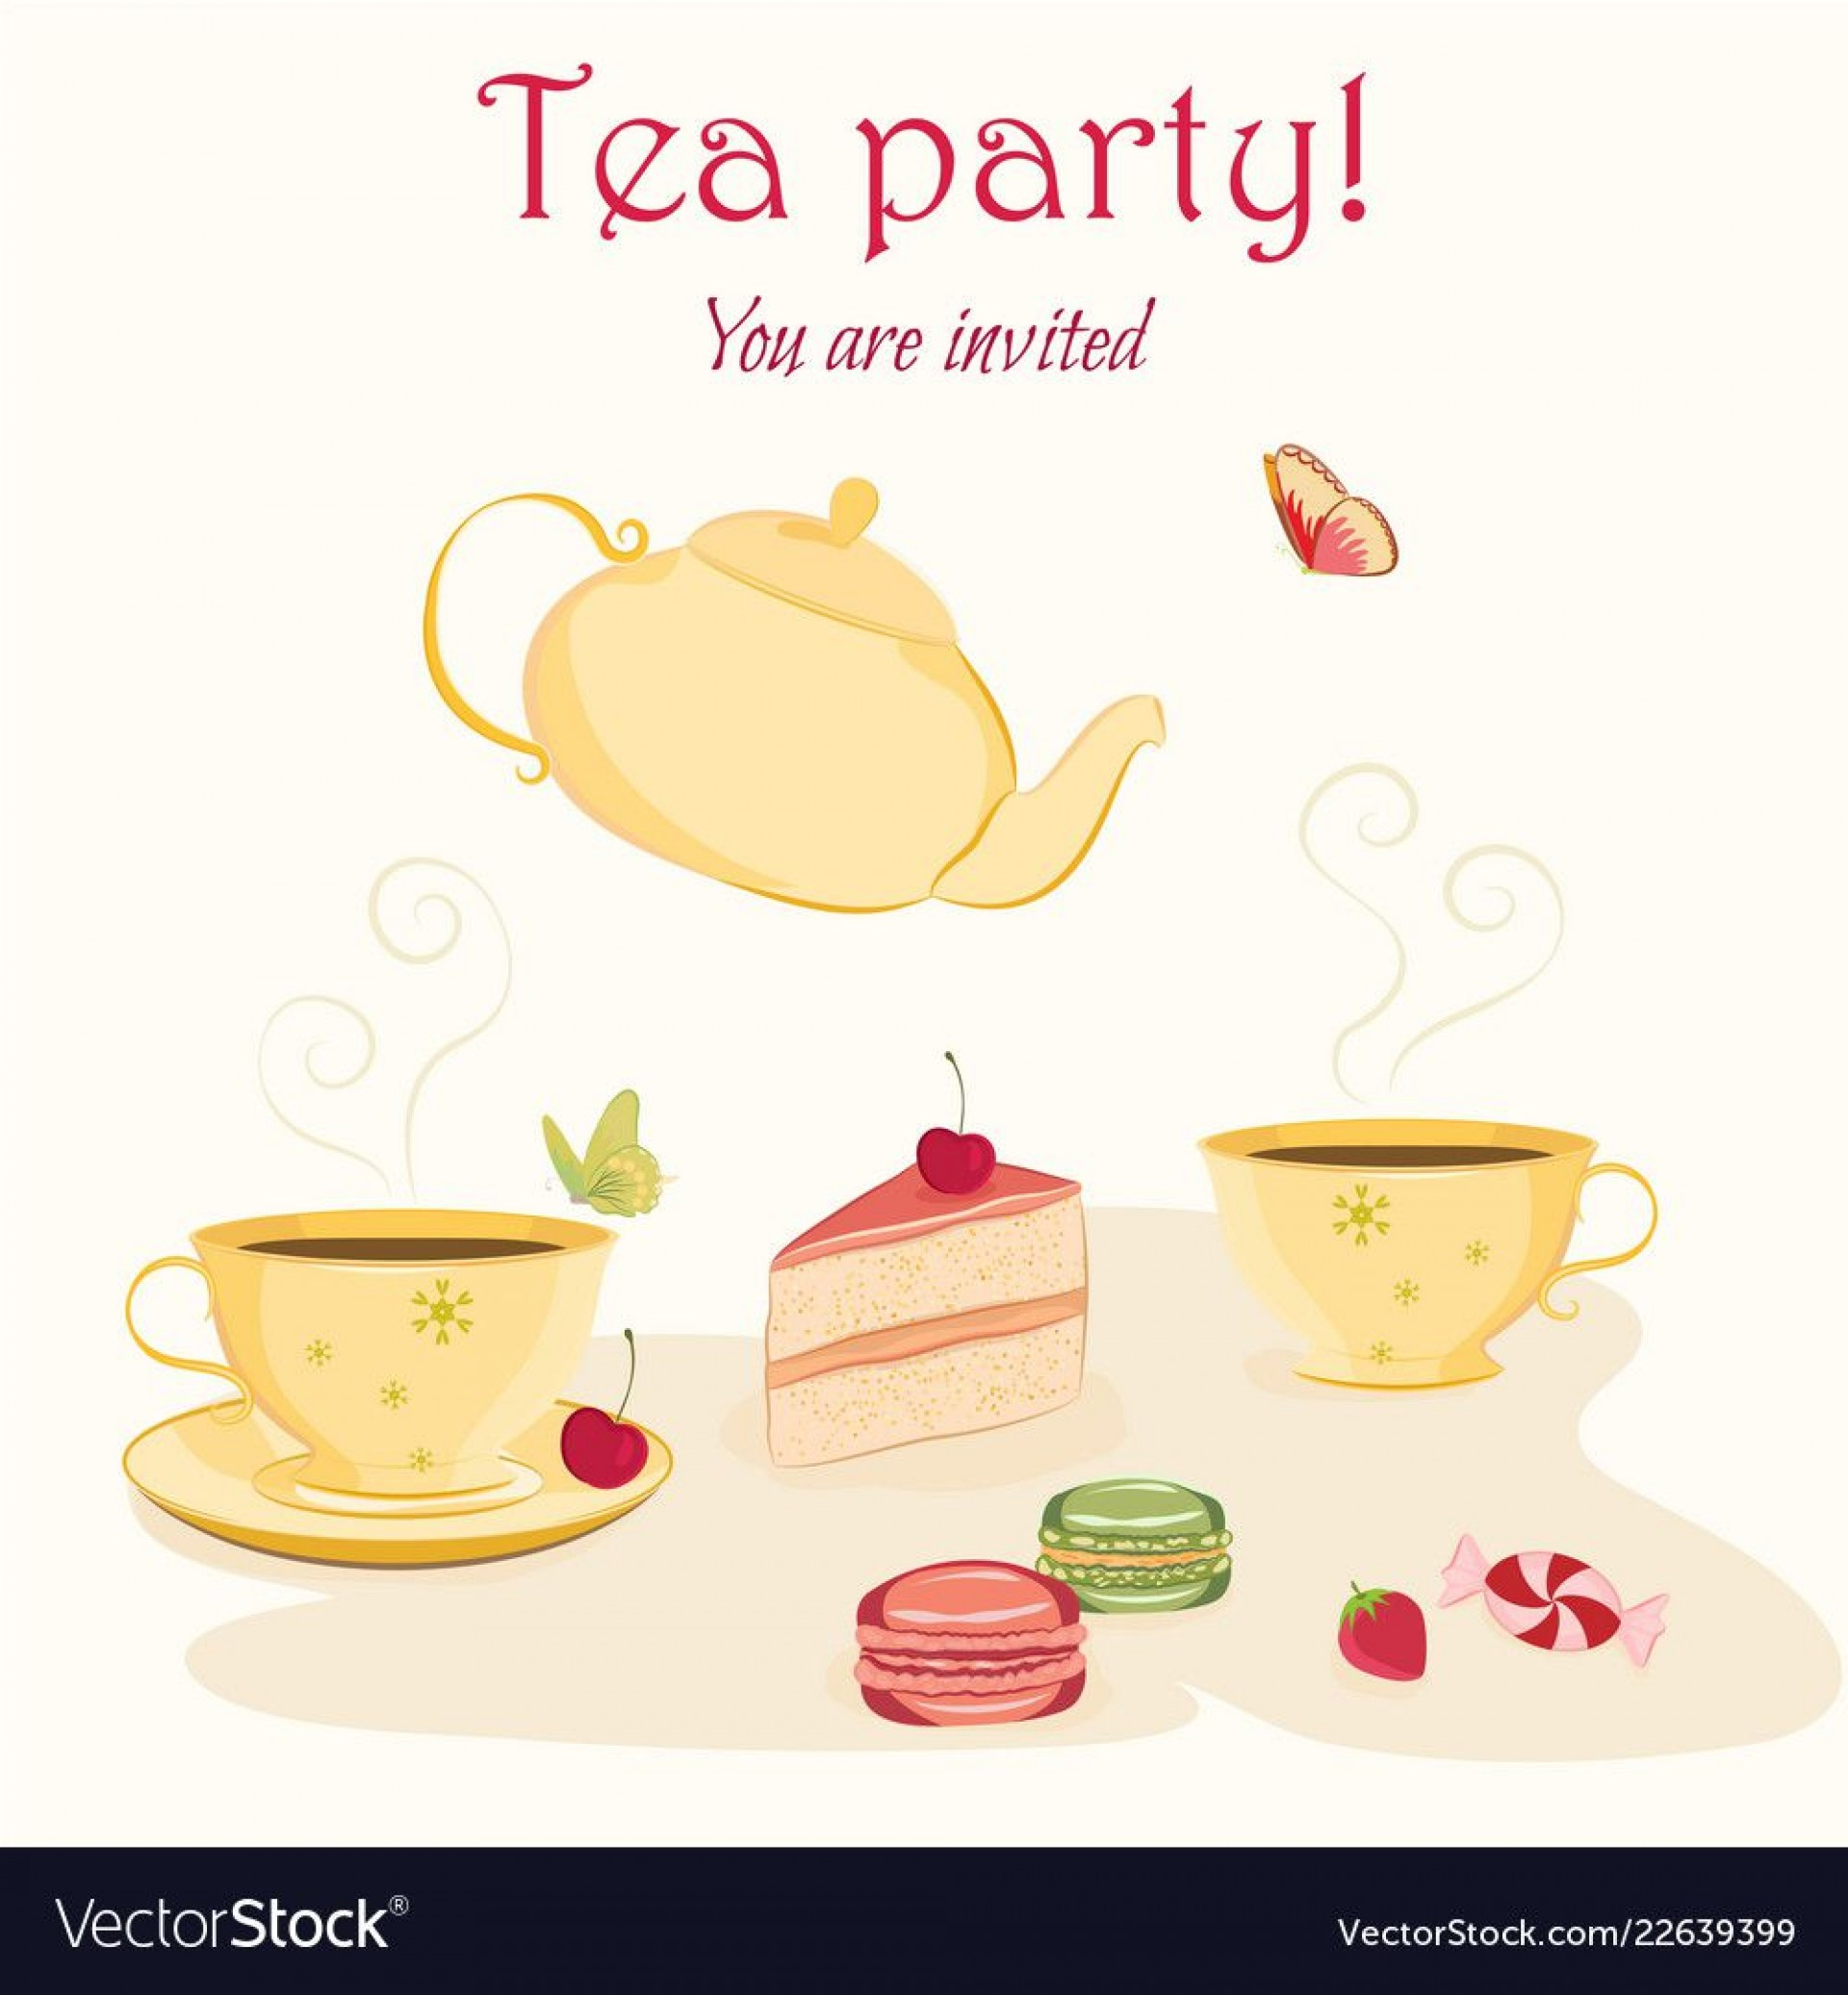 006 Unique Tea Party Invitation Template Design  Templates High Free Download Bridal Shower1920